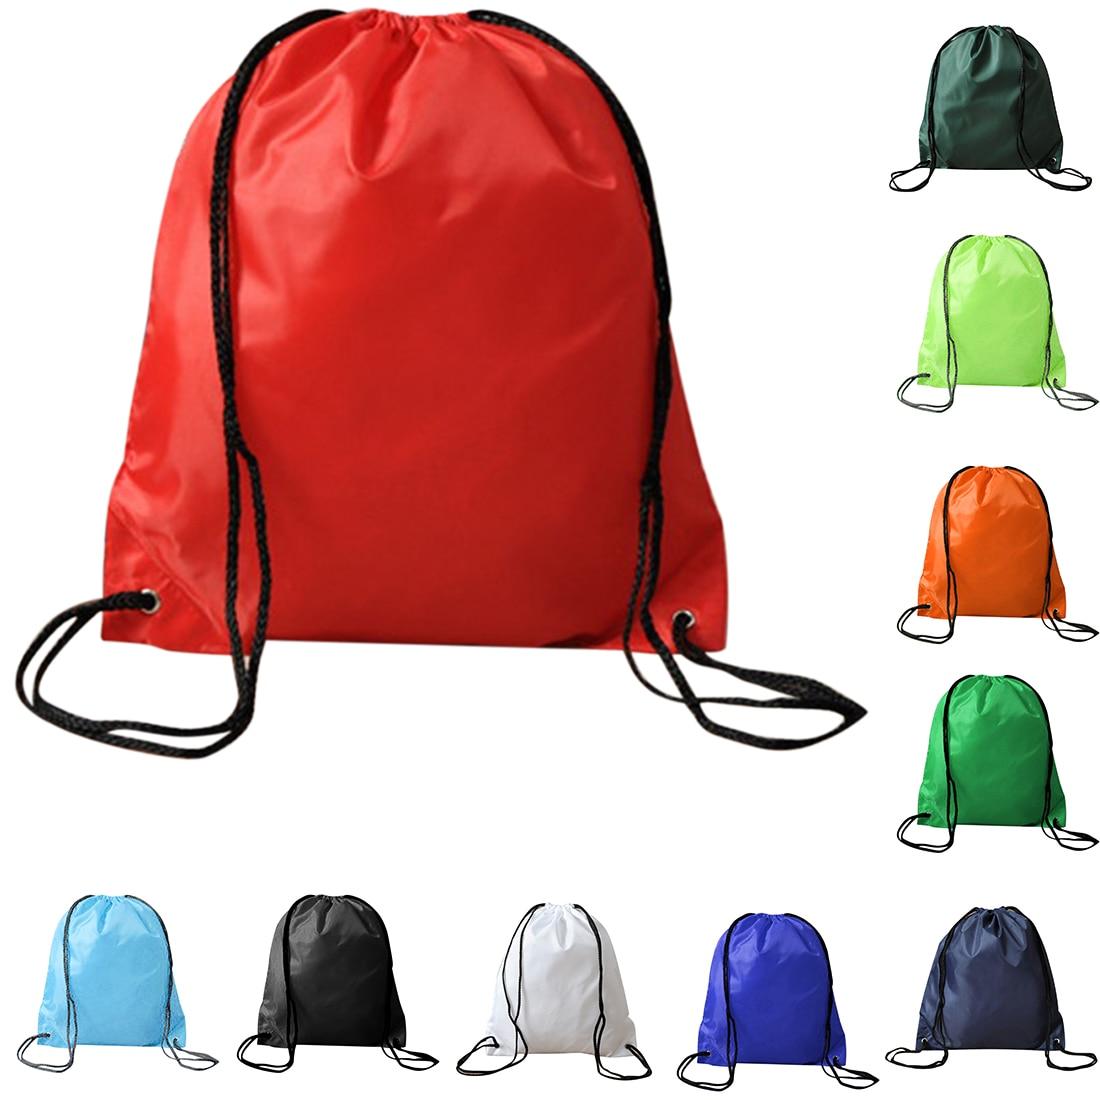 Drawstring Bags String Sack Beach Women Men Travel Storage Package Functional Backpack Plecak Worek Sznurek Gift Pouch Fashion